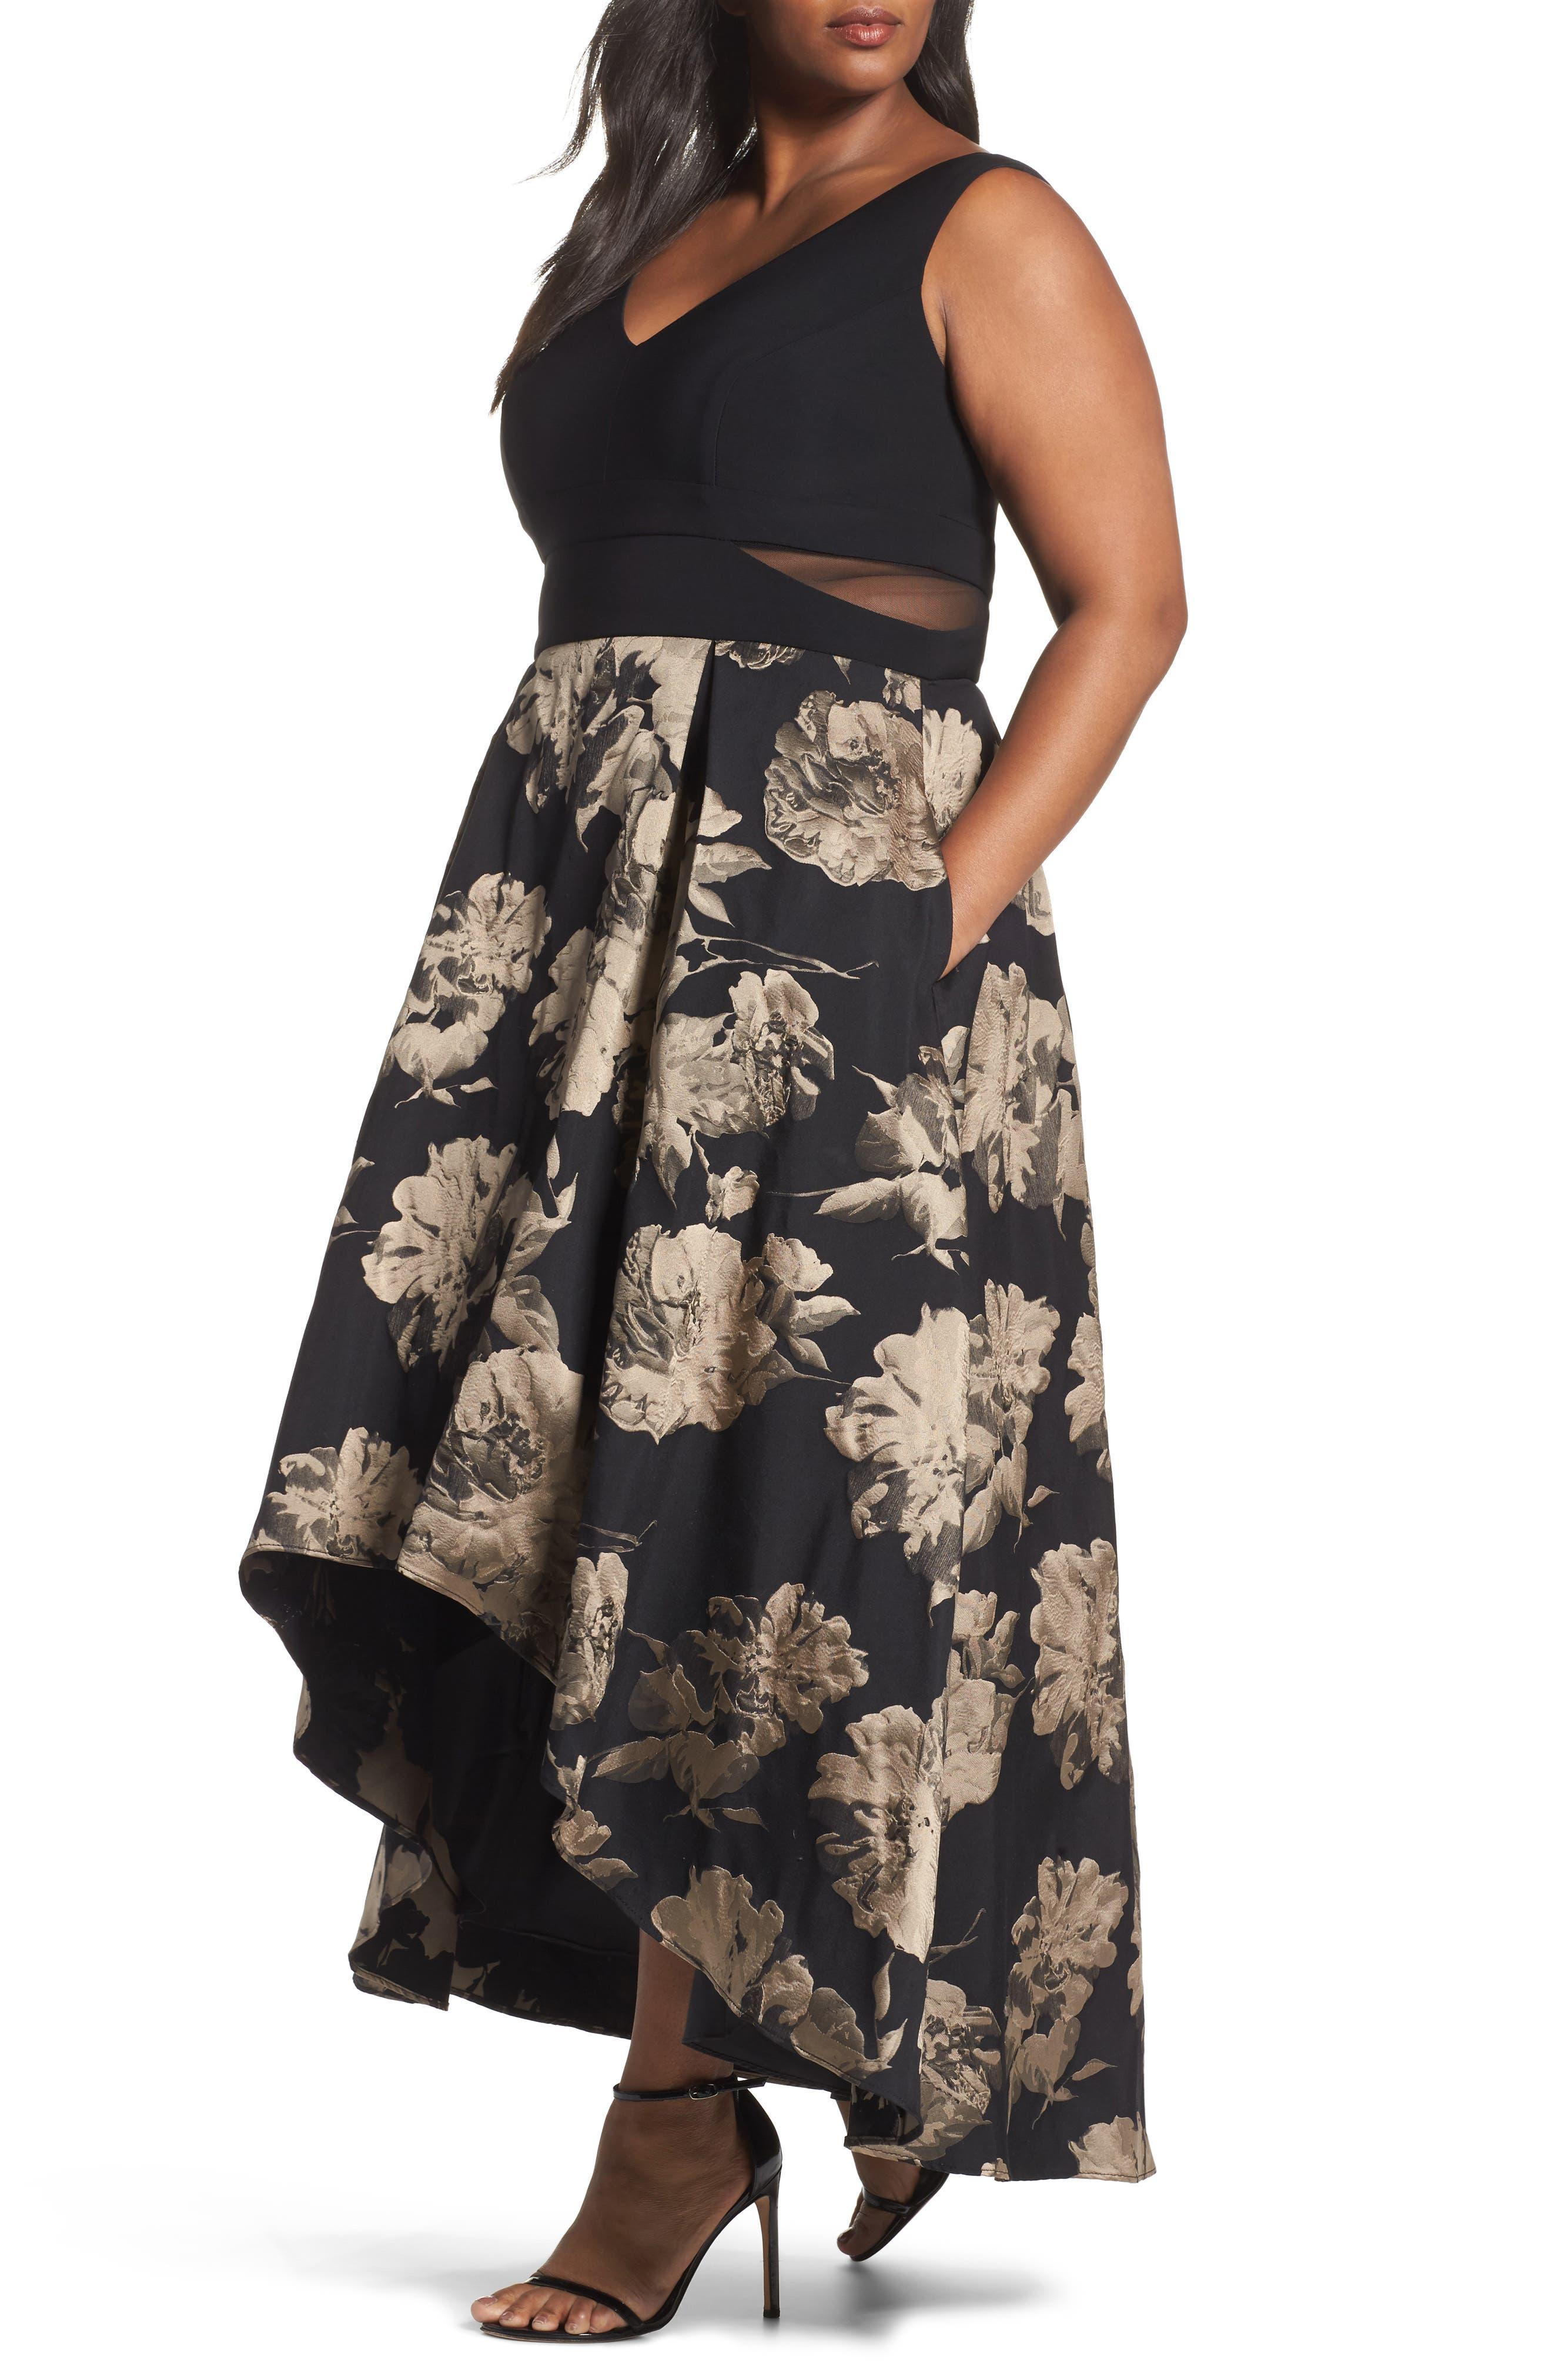 Mesh Waist High/Low Brocade Dress,                             Main thumbnail 1, color,                             Black/ Champagne